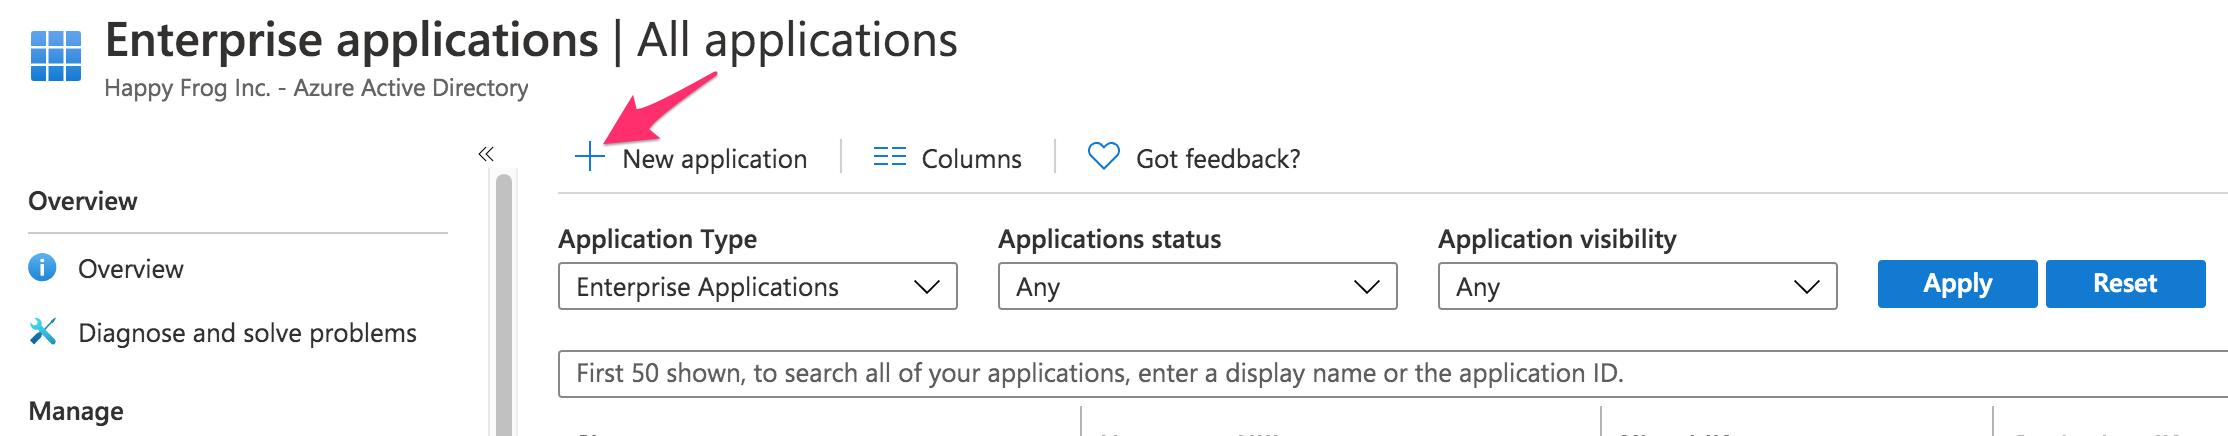 Enterprise_applications___All_applications_-_Azure_Active_Directory_admin_center.png